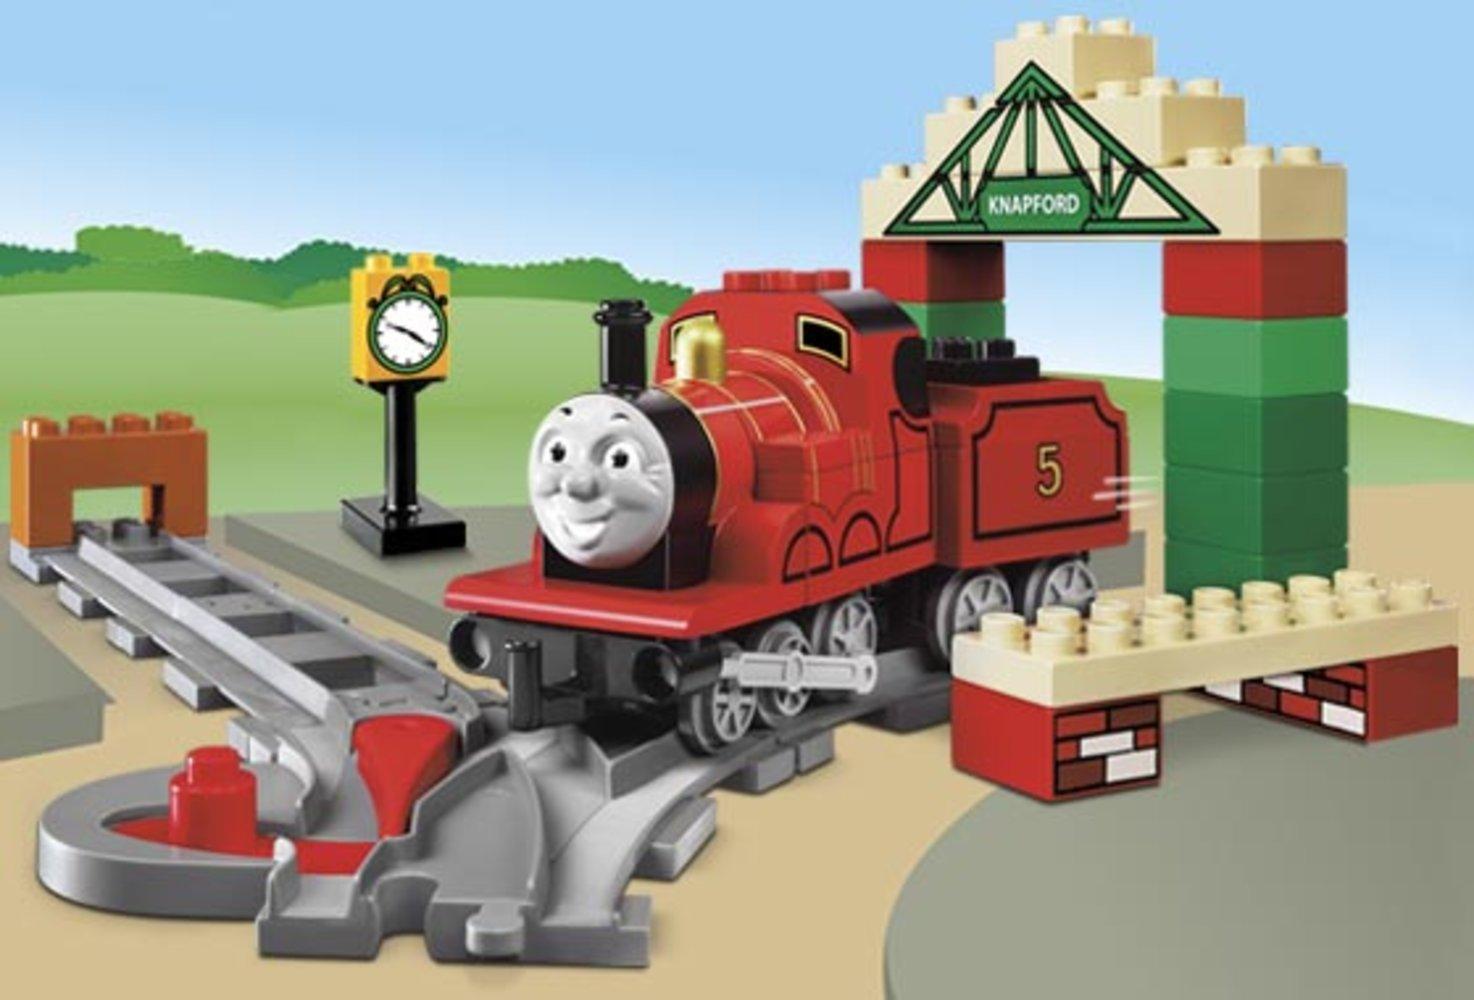 James at Knapford Station